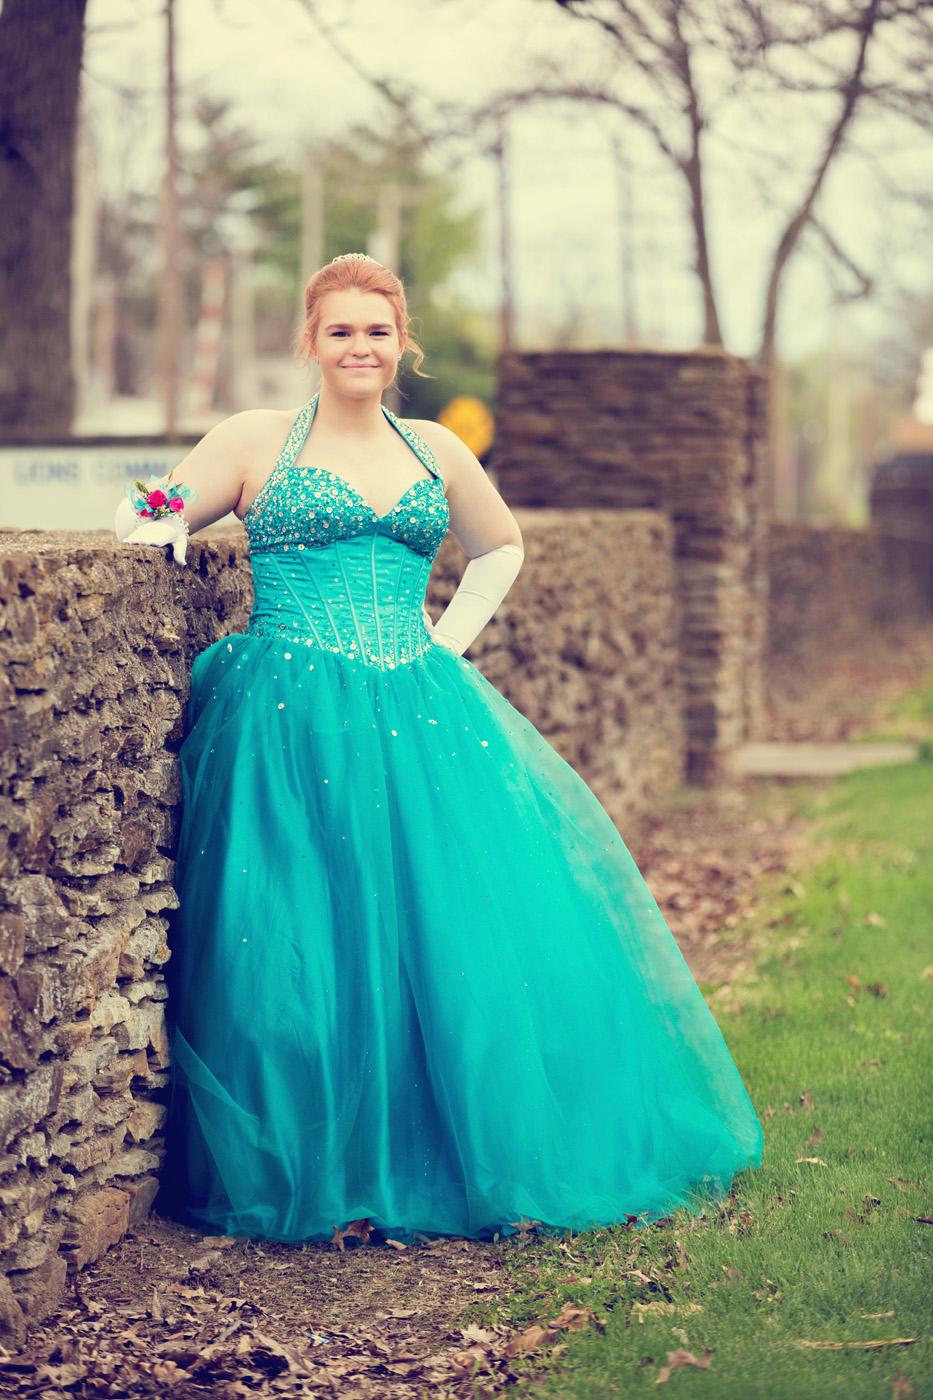 Garrett & Helen Prom 2014 151_1.jpg